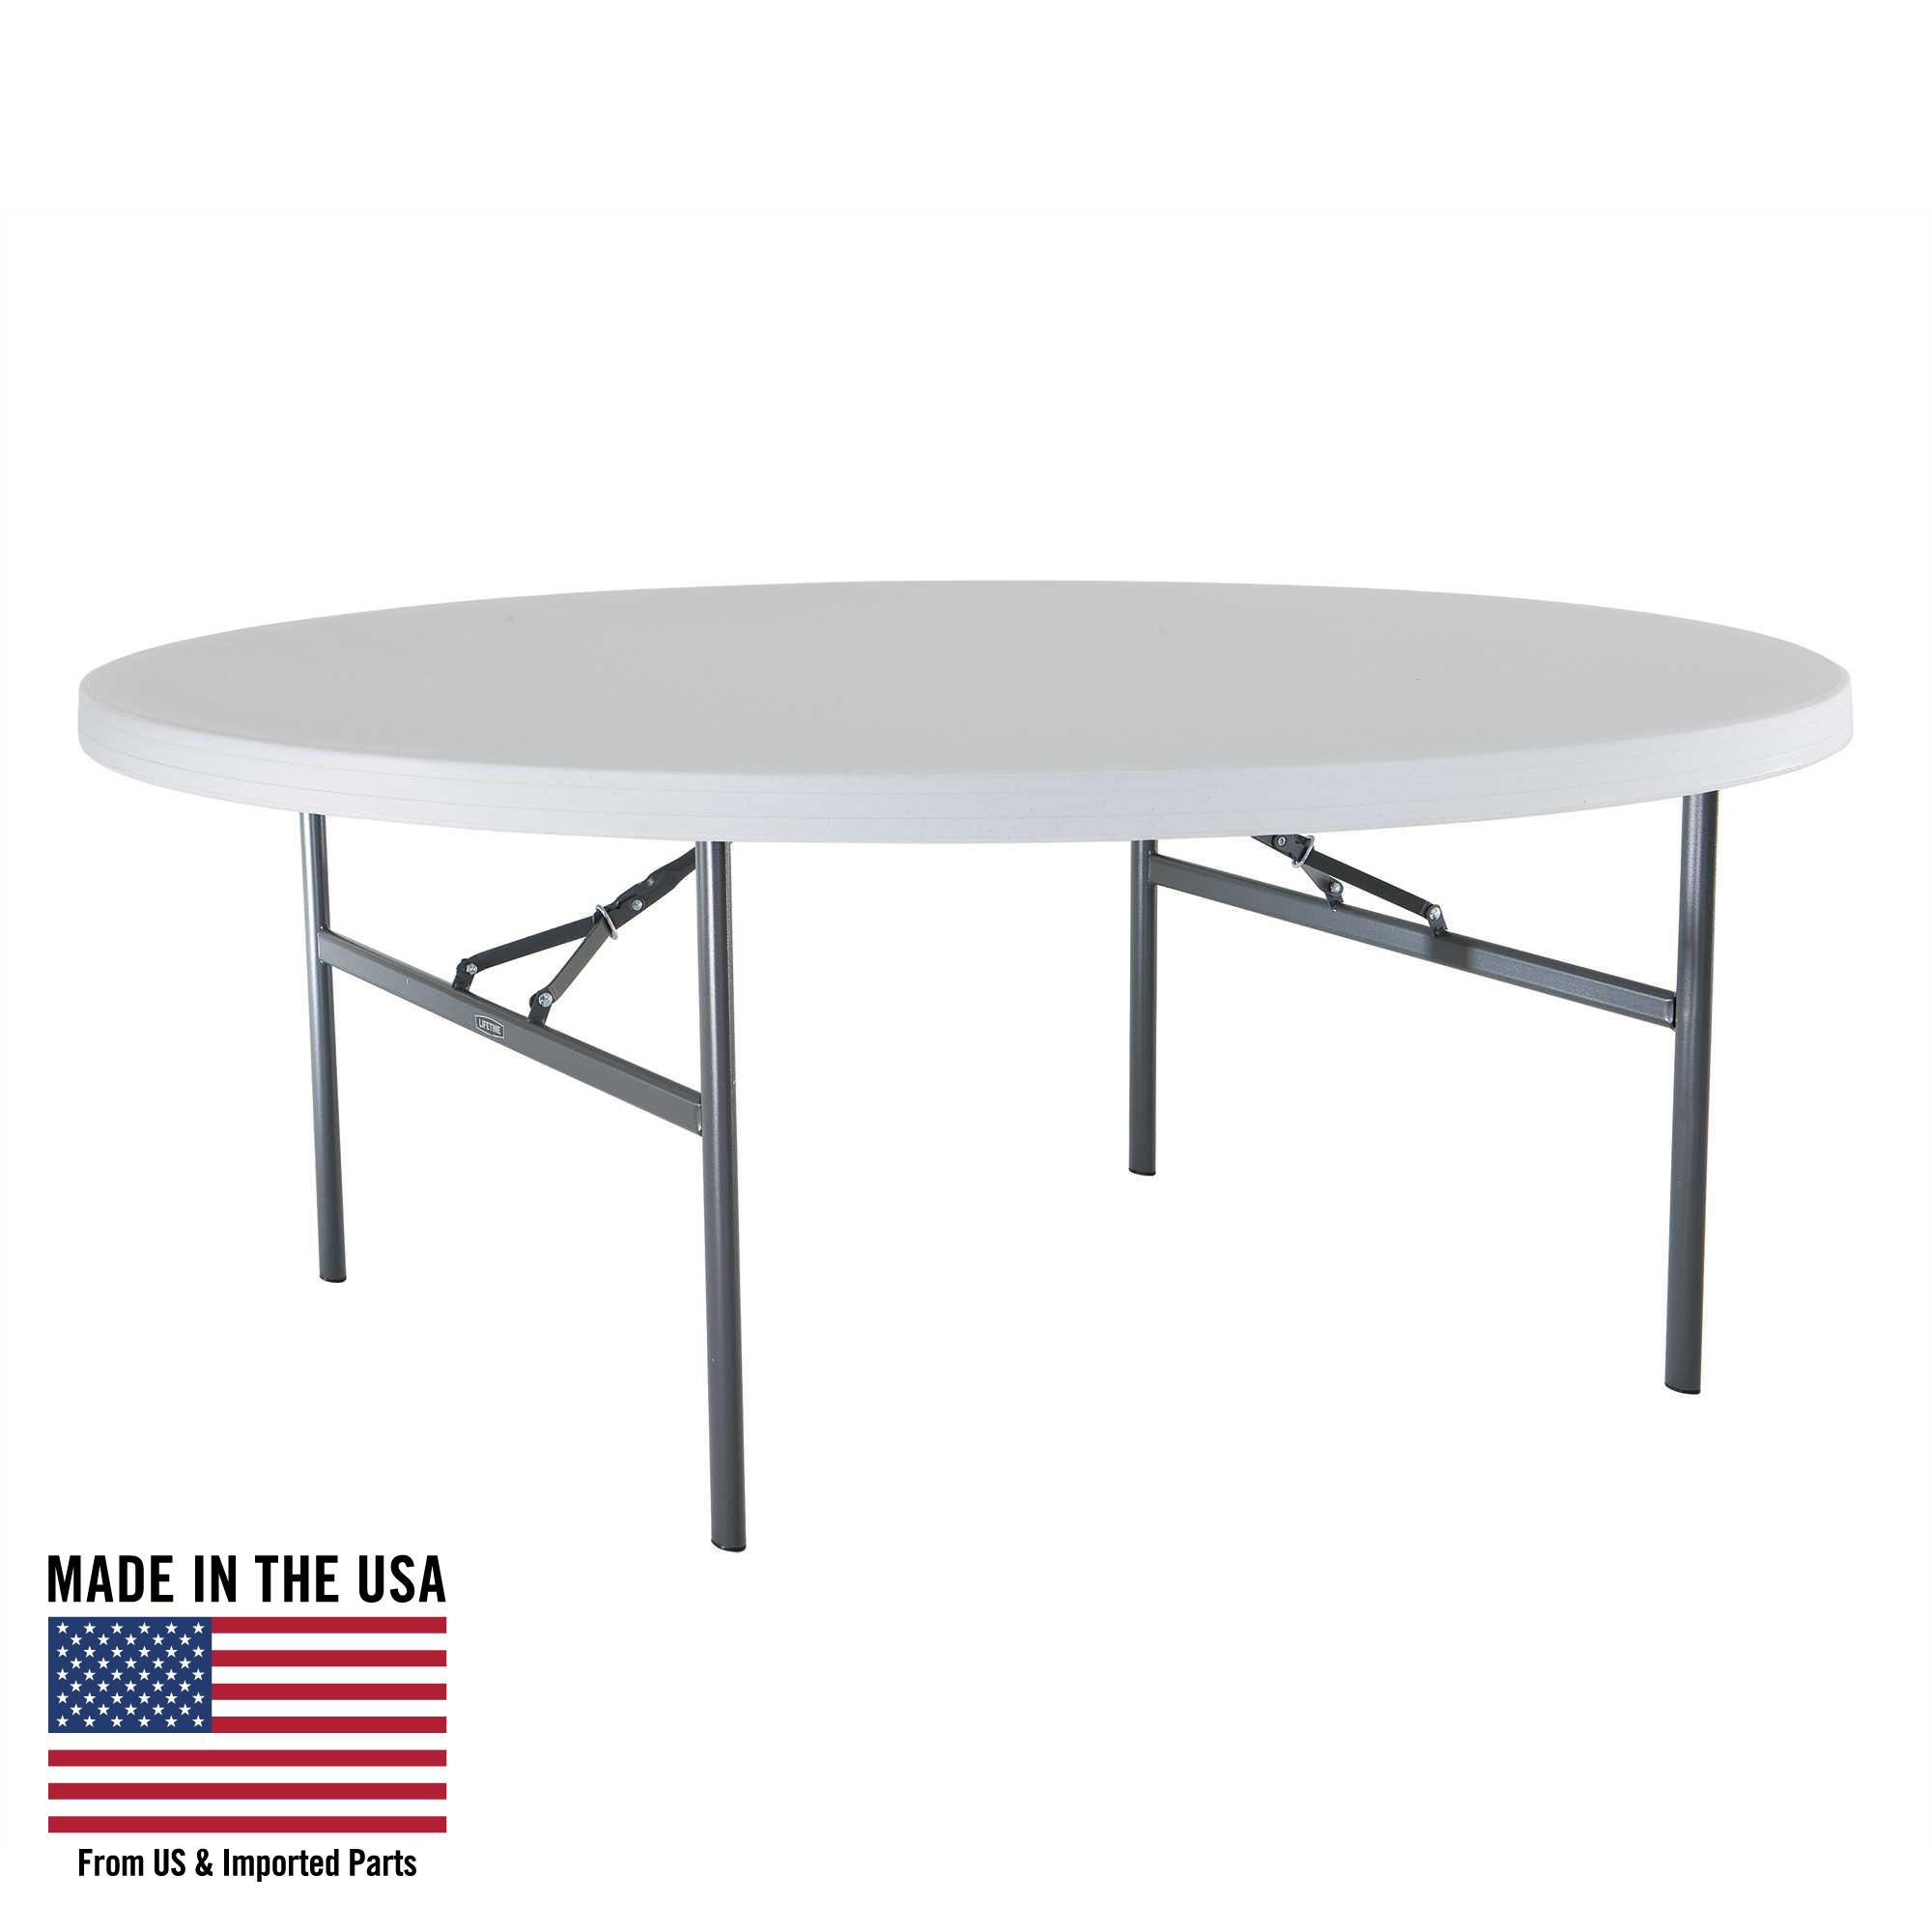 Lifetime White Granite 6 Foot Round Table With Folding Legs 22673 Walmart Com Walmart Com